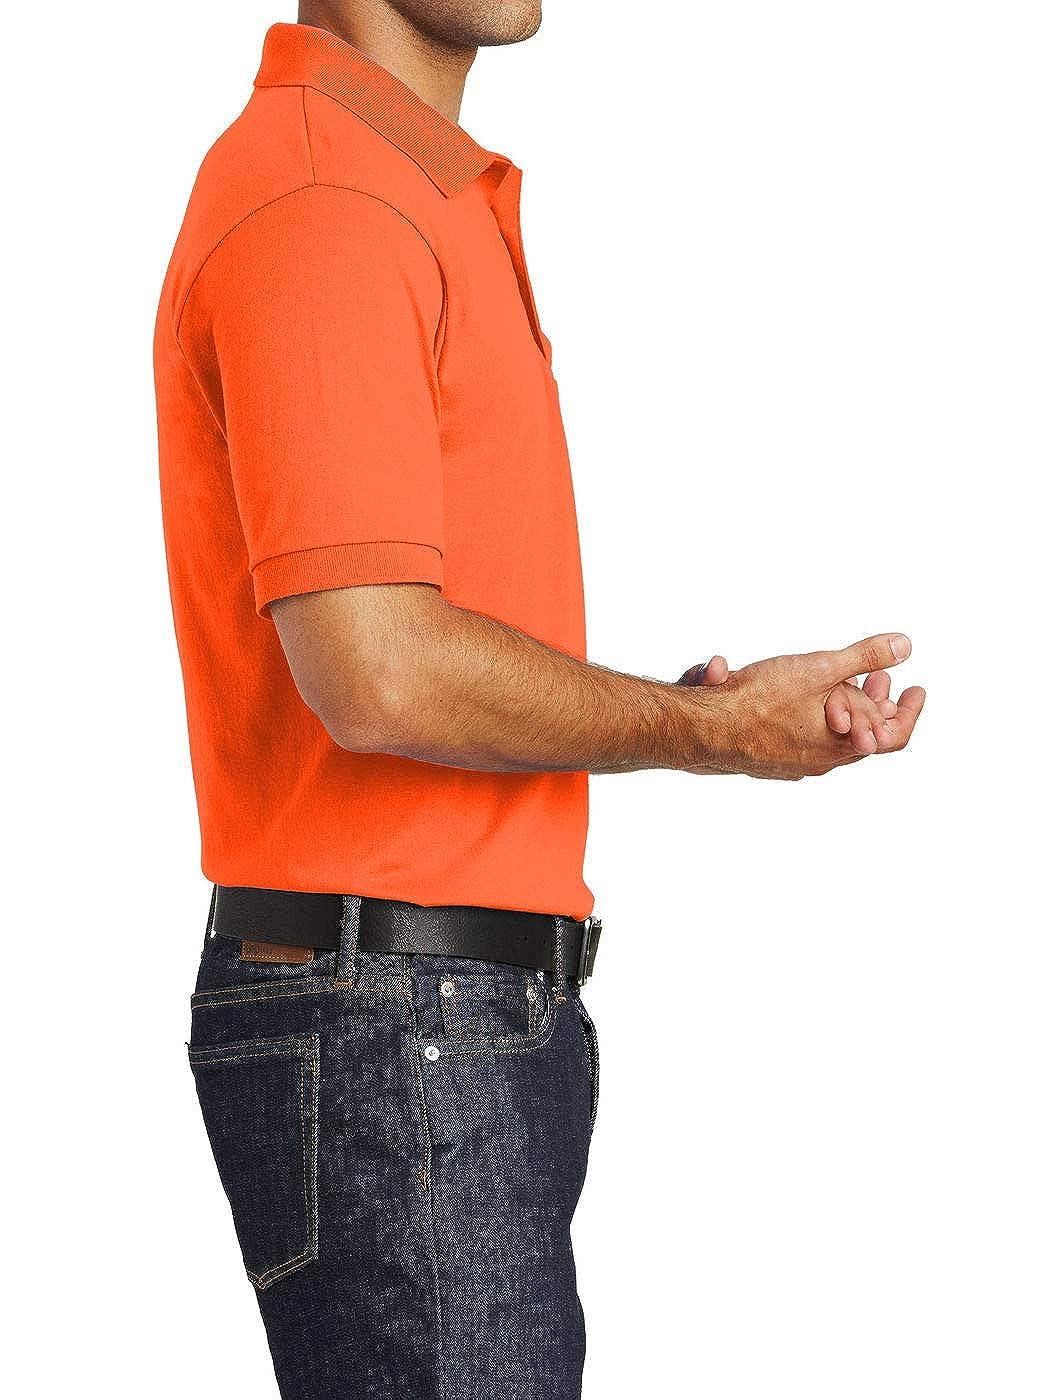 Mafoose Mens Core Blend Jersey Knit Pocket Polo Shirt